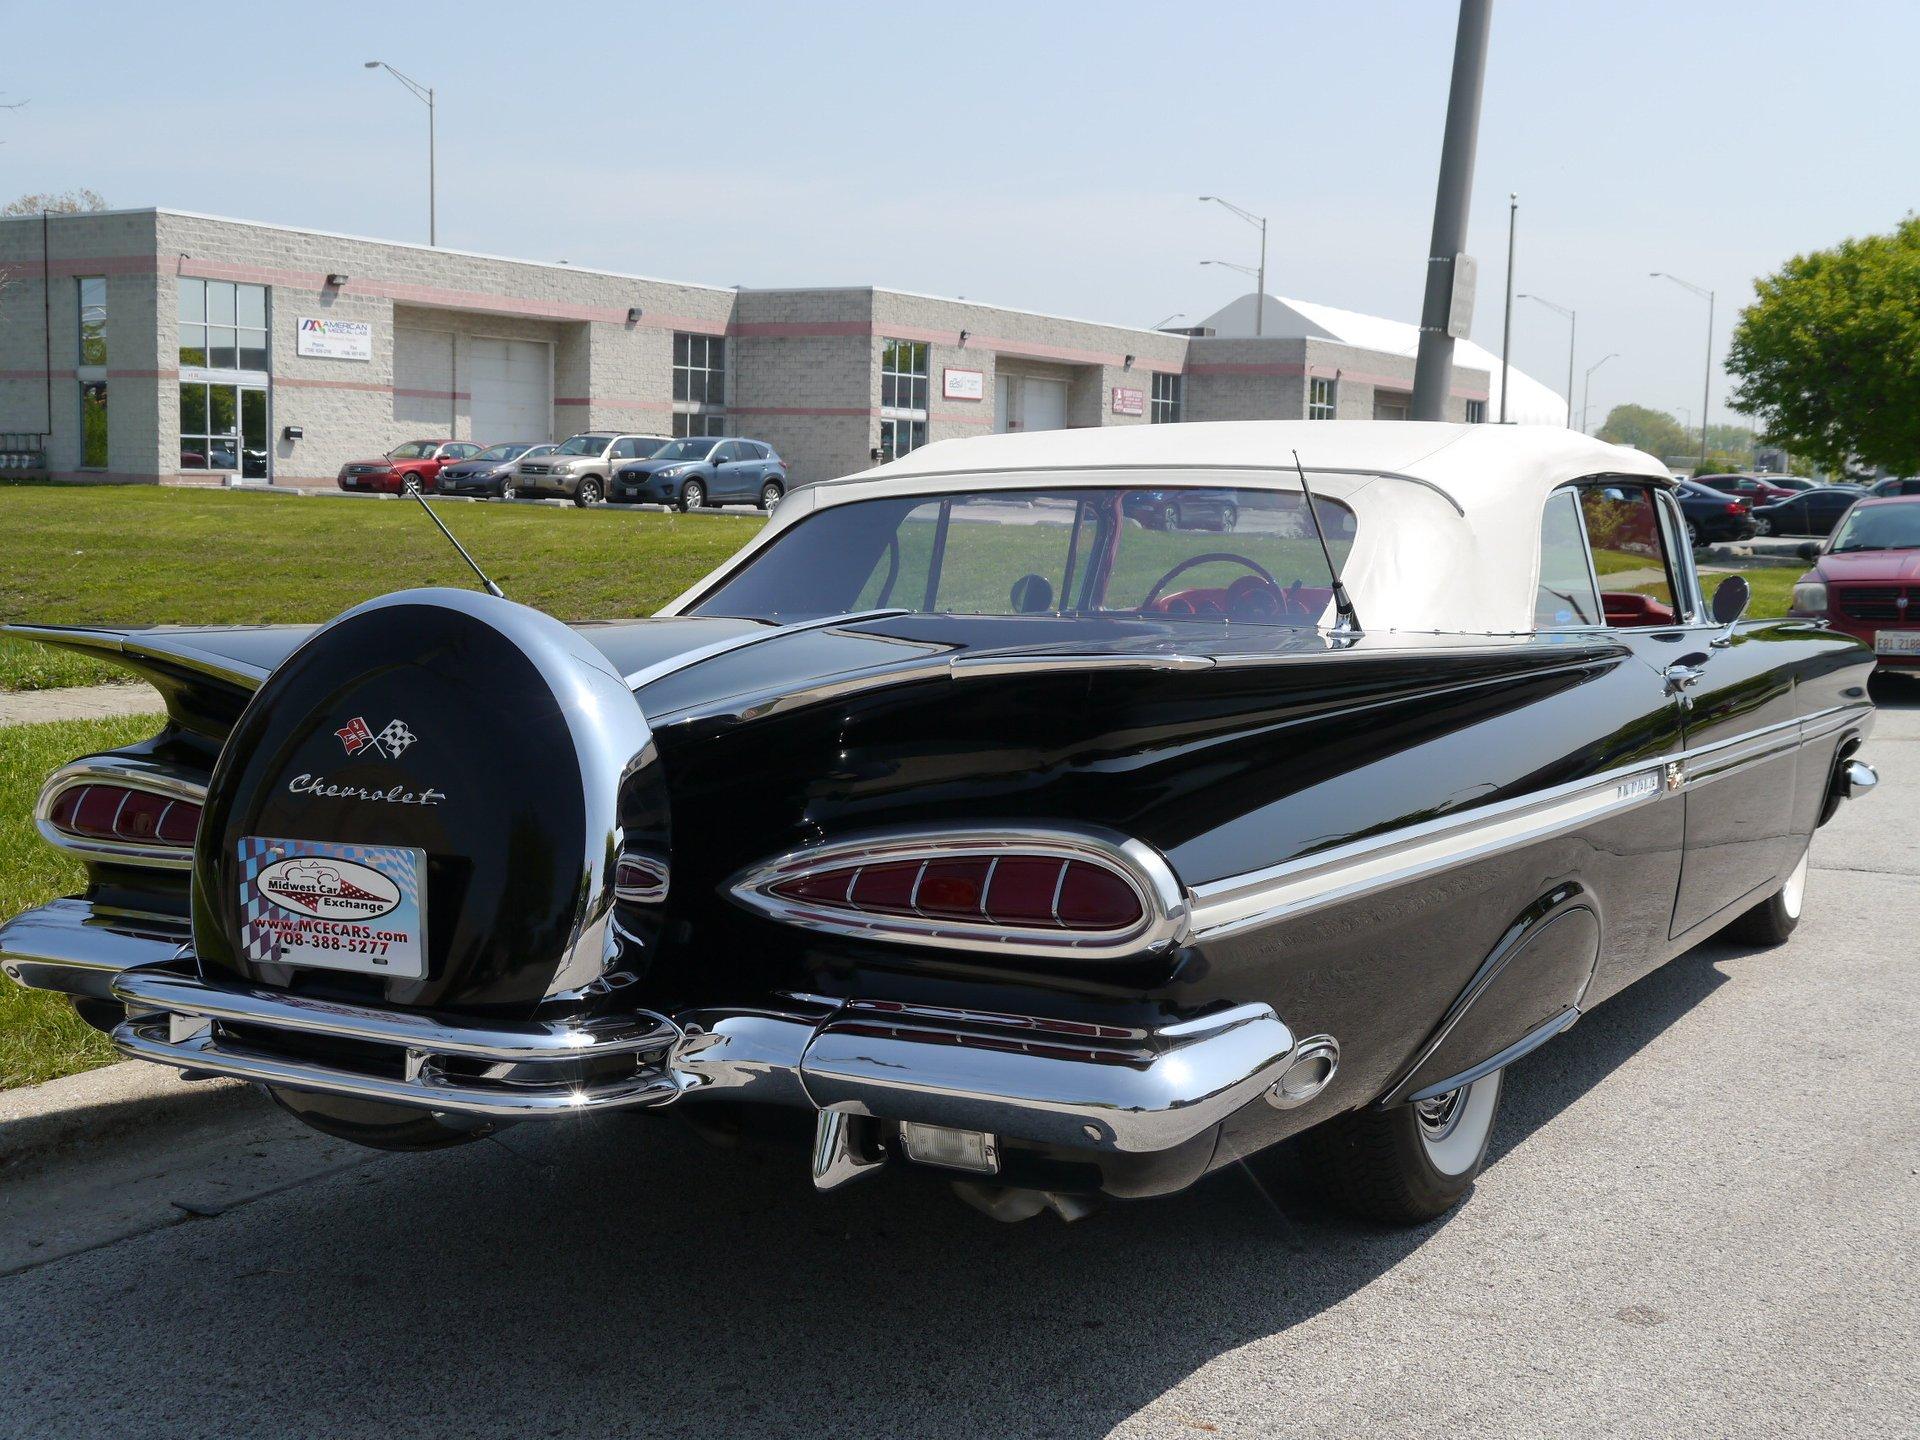 1959 Chevrolet Impala Convertible for sale #50656   MCG